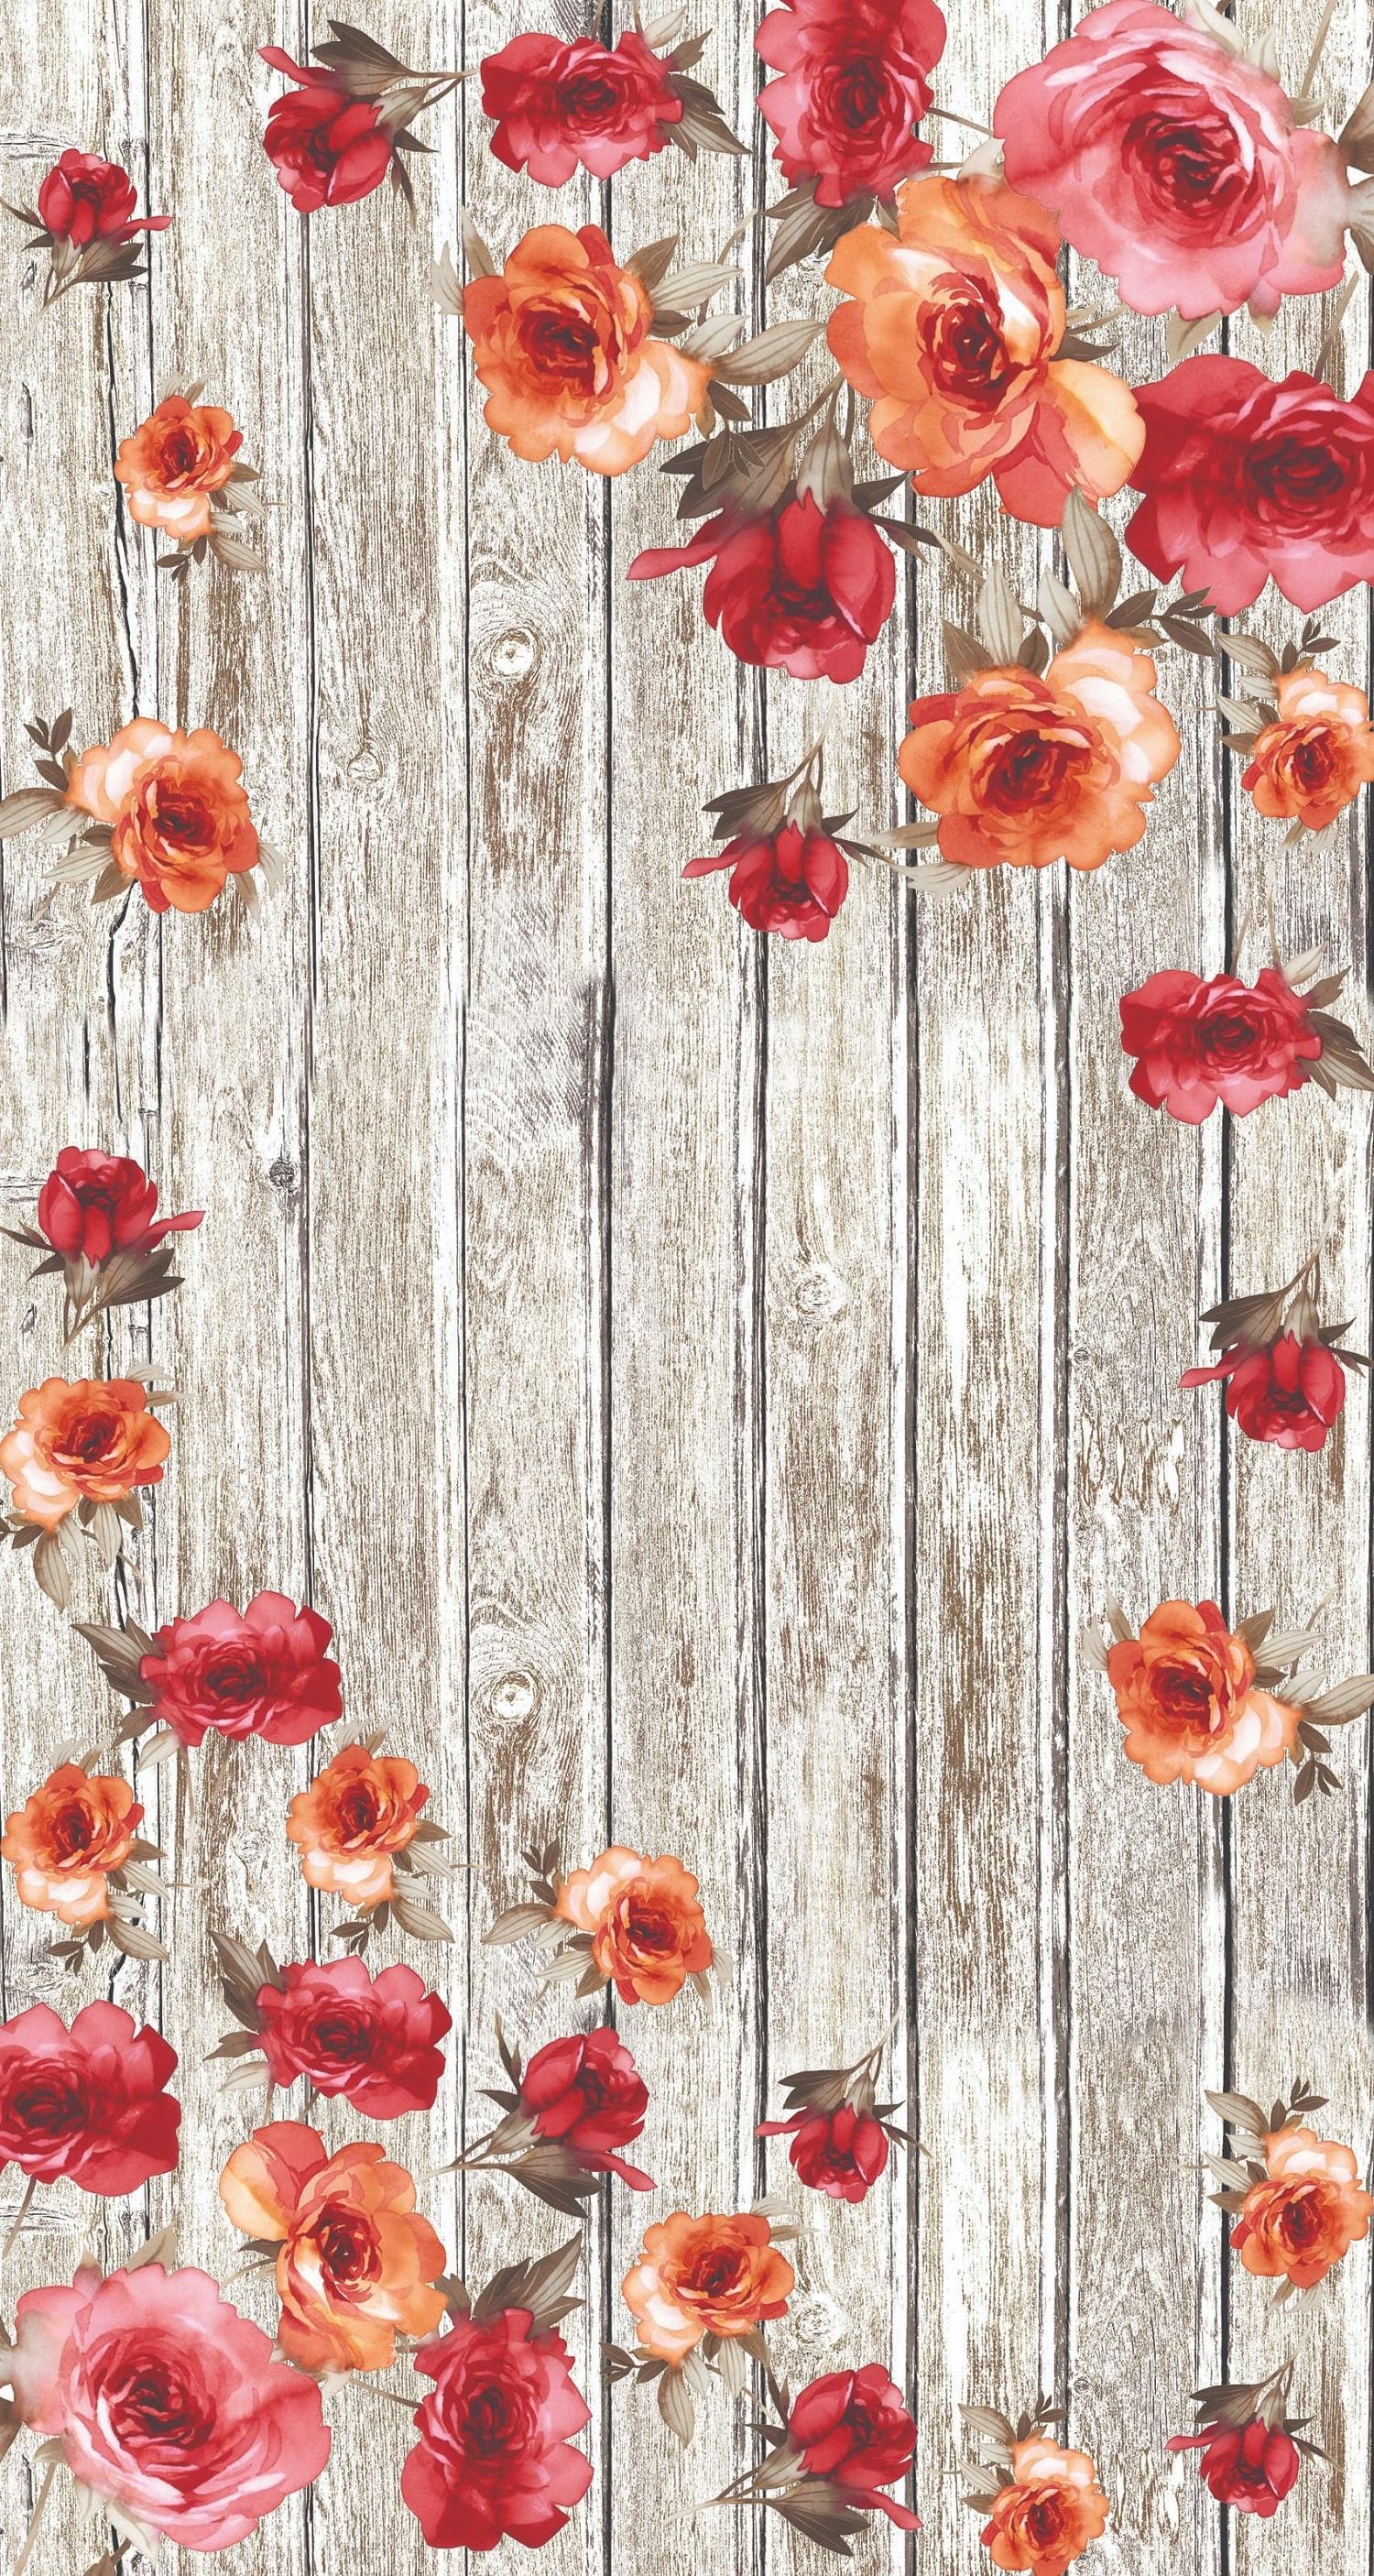 Covor Roses 5017 Multicolor, 160 x 230 cm